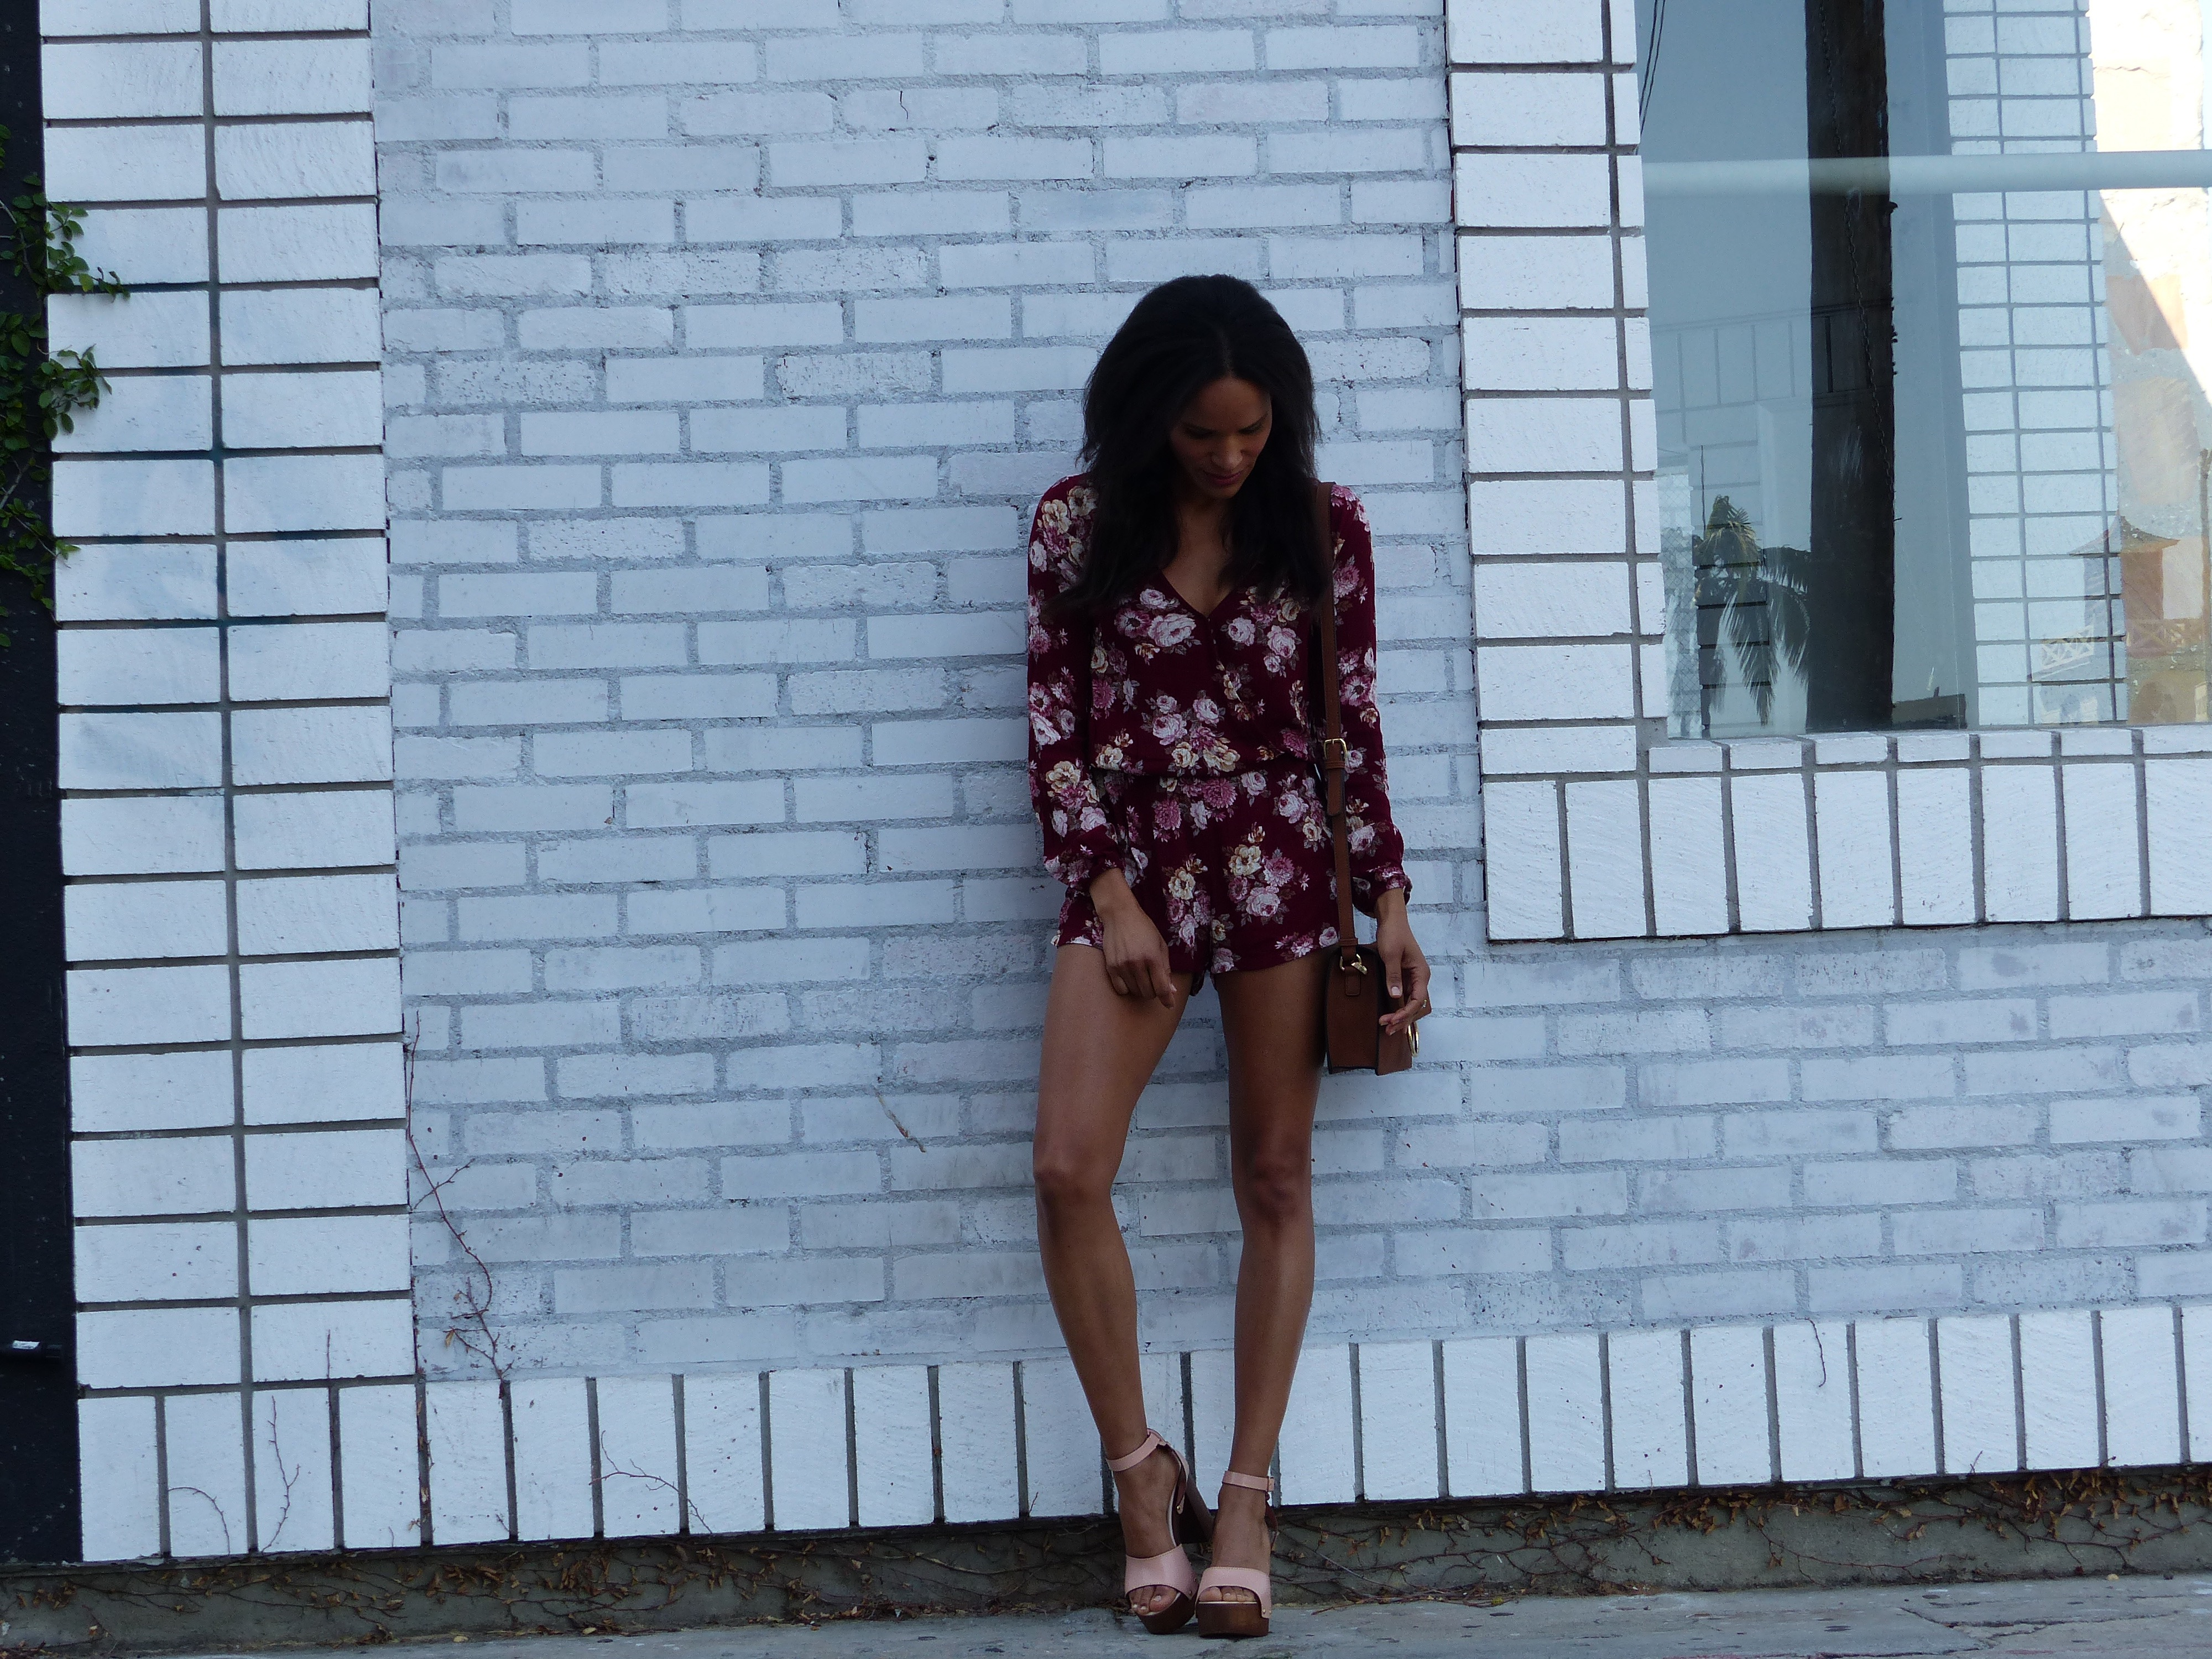 d83dd989ae1 Amanda Luttrell Garrigus Forever 21 floral Romper and Blush Sandal